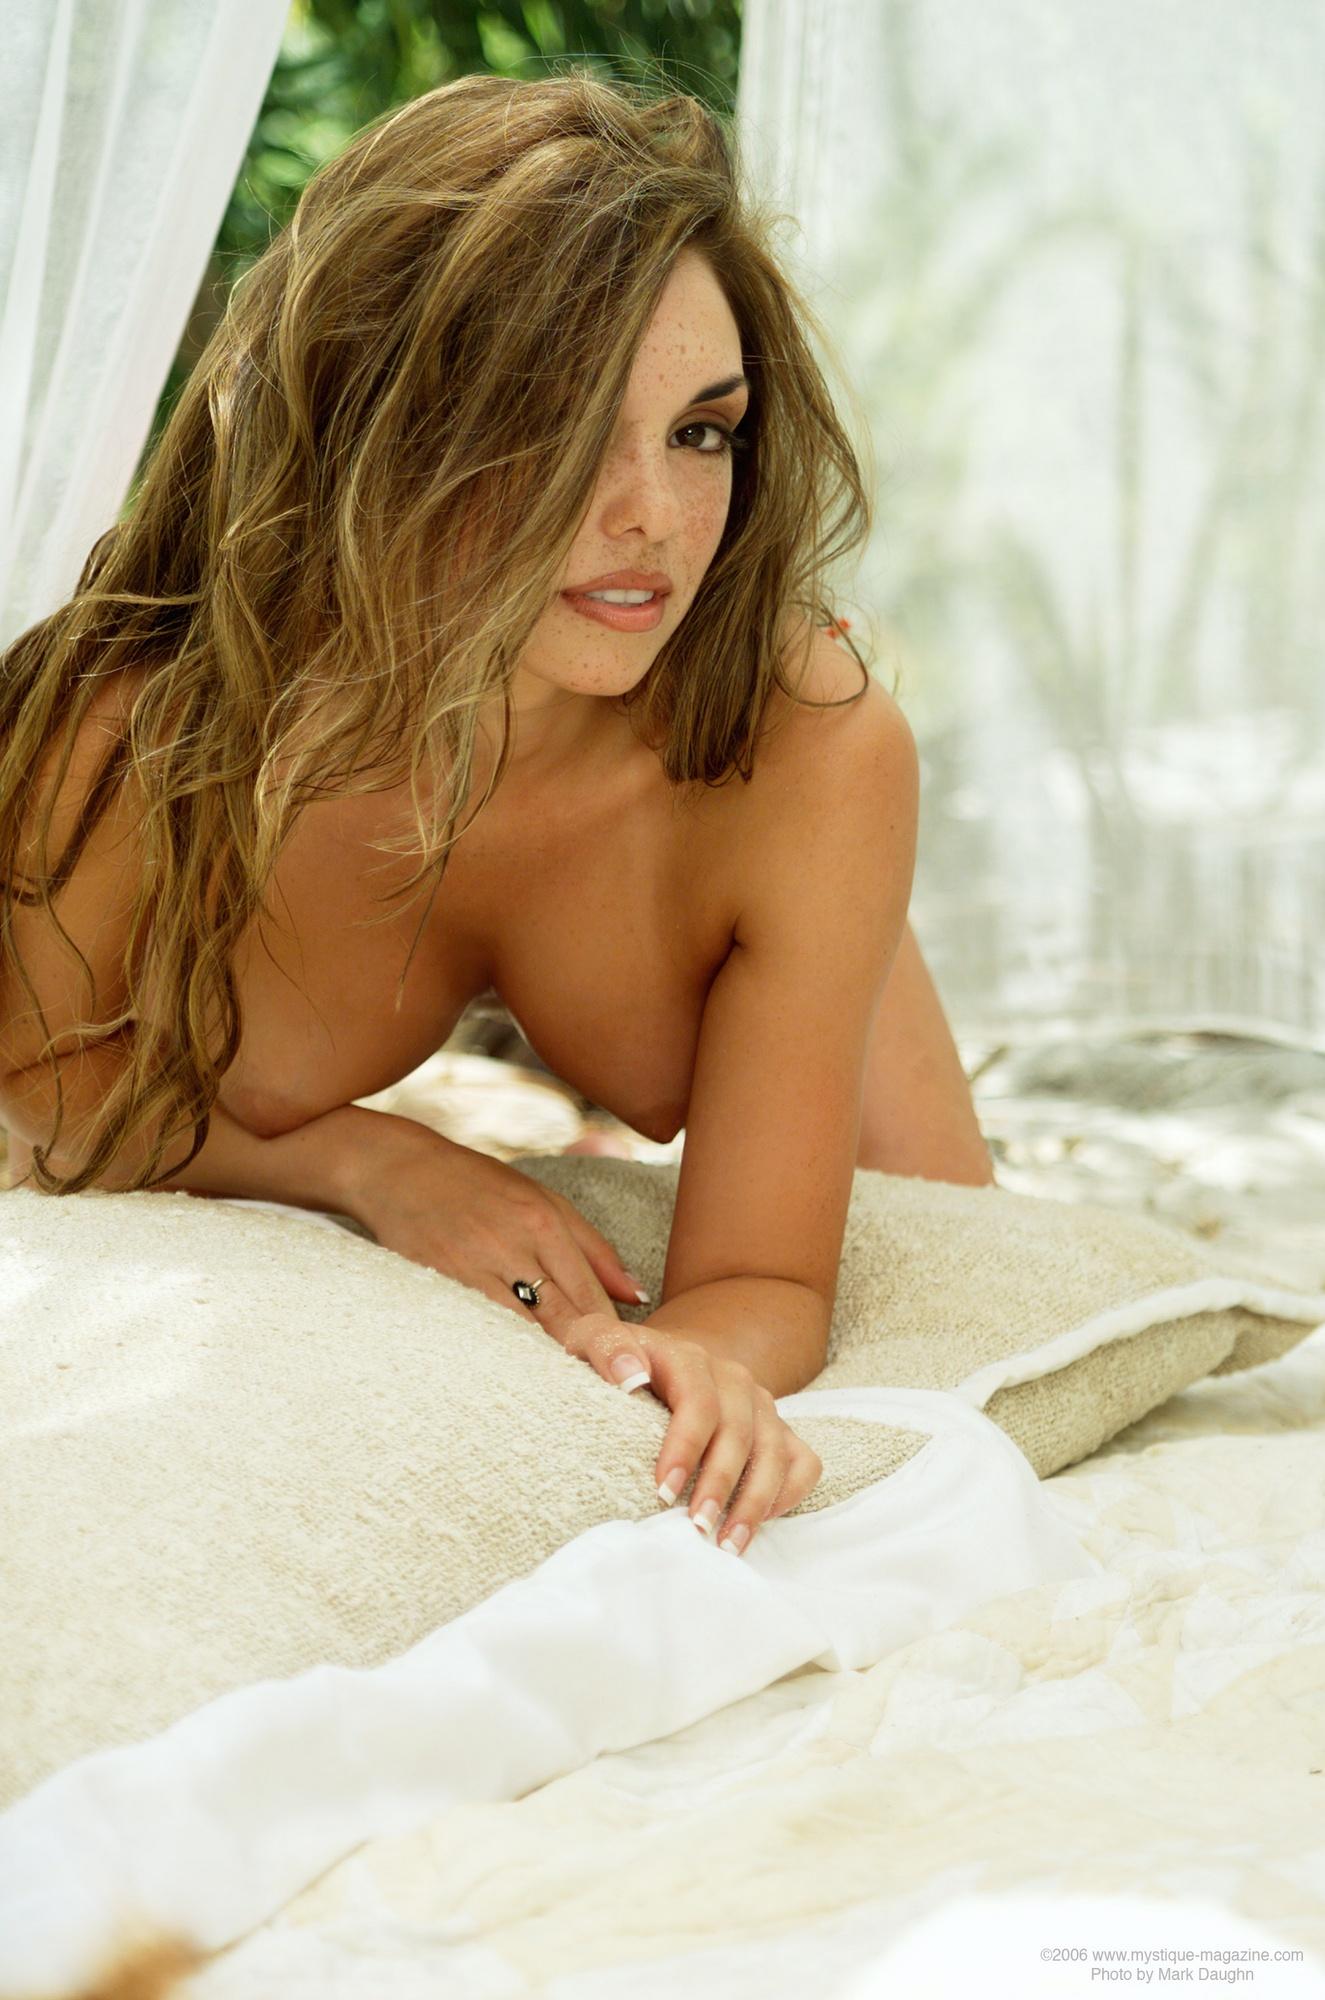 danielle-gamba-boobs-white-fishnet-nude-mystique-13